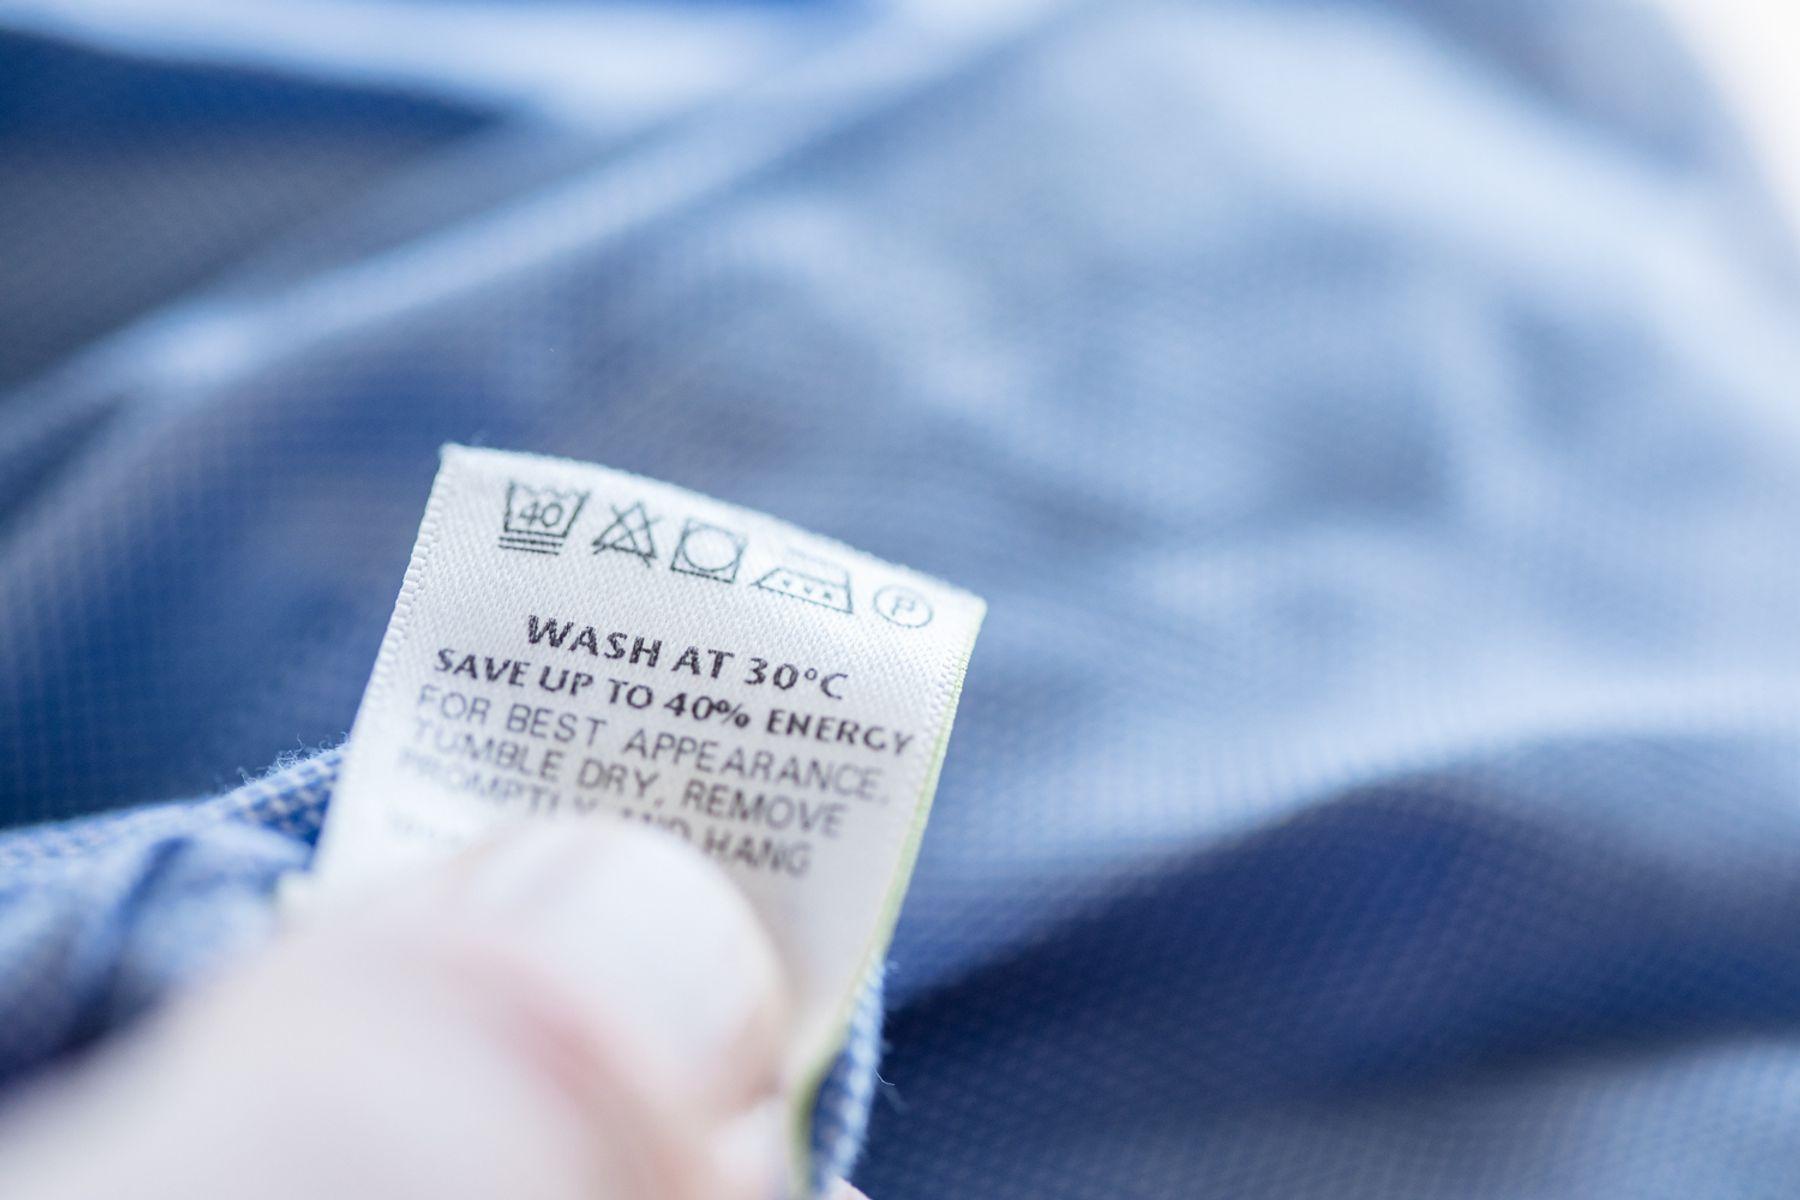 Laundry care label